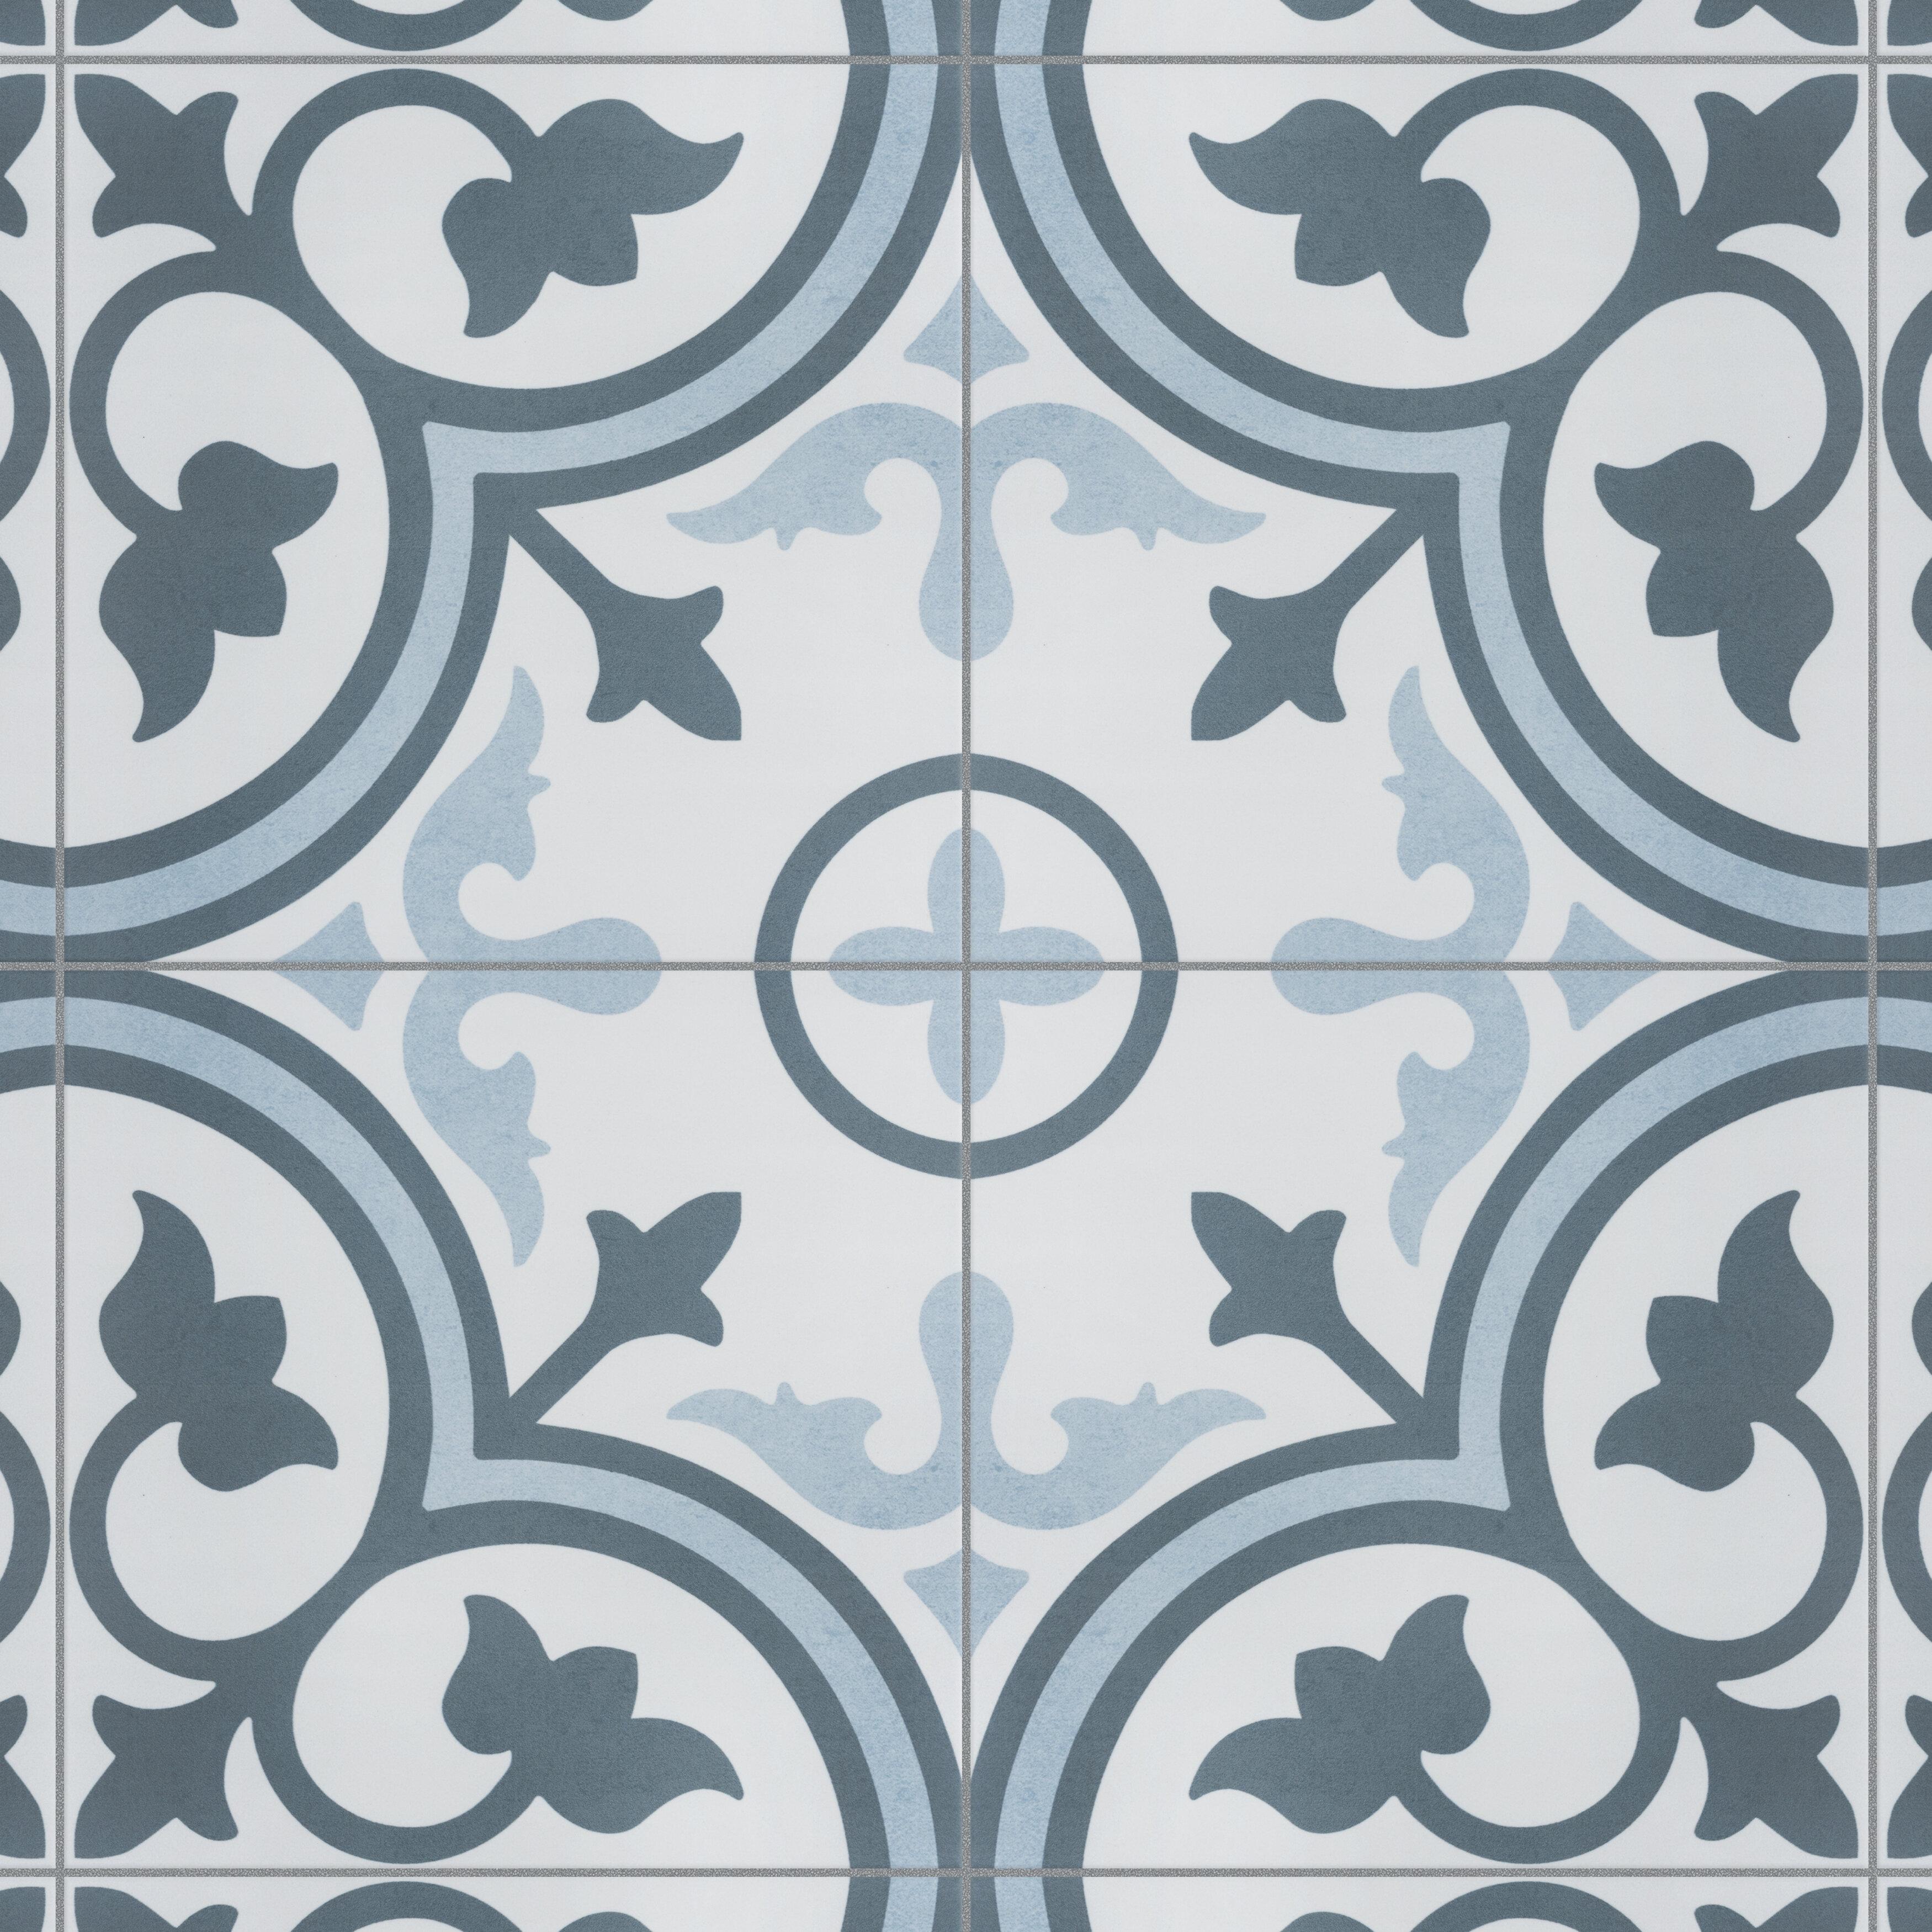 Small Ceramic Tiles ~ Dream Art ~ Dream Decor  ~ Dream Designs ~ Ceramic Tile Wall Art ~ Inspirational Wall Art~Small Tiles~Ceramic Tile Art